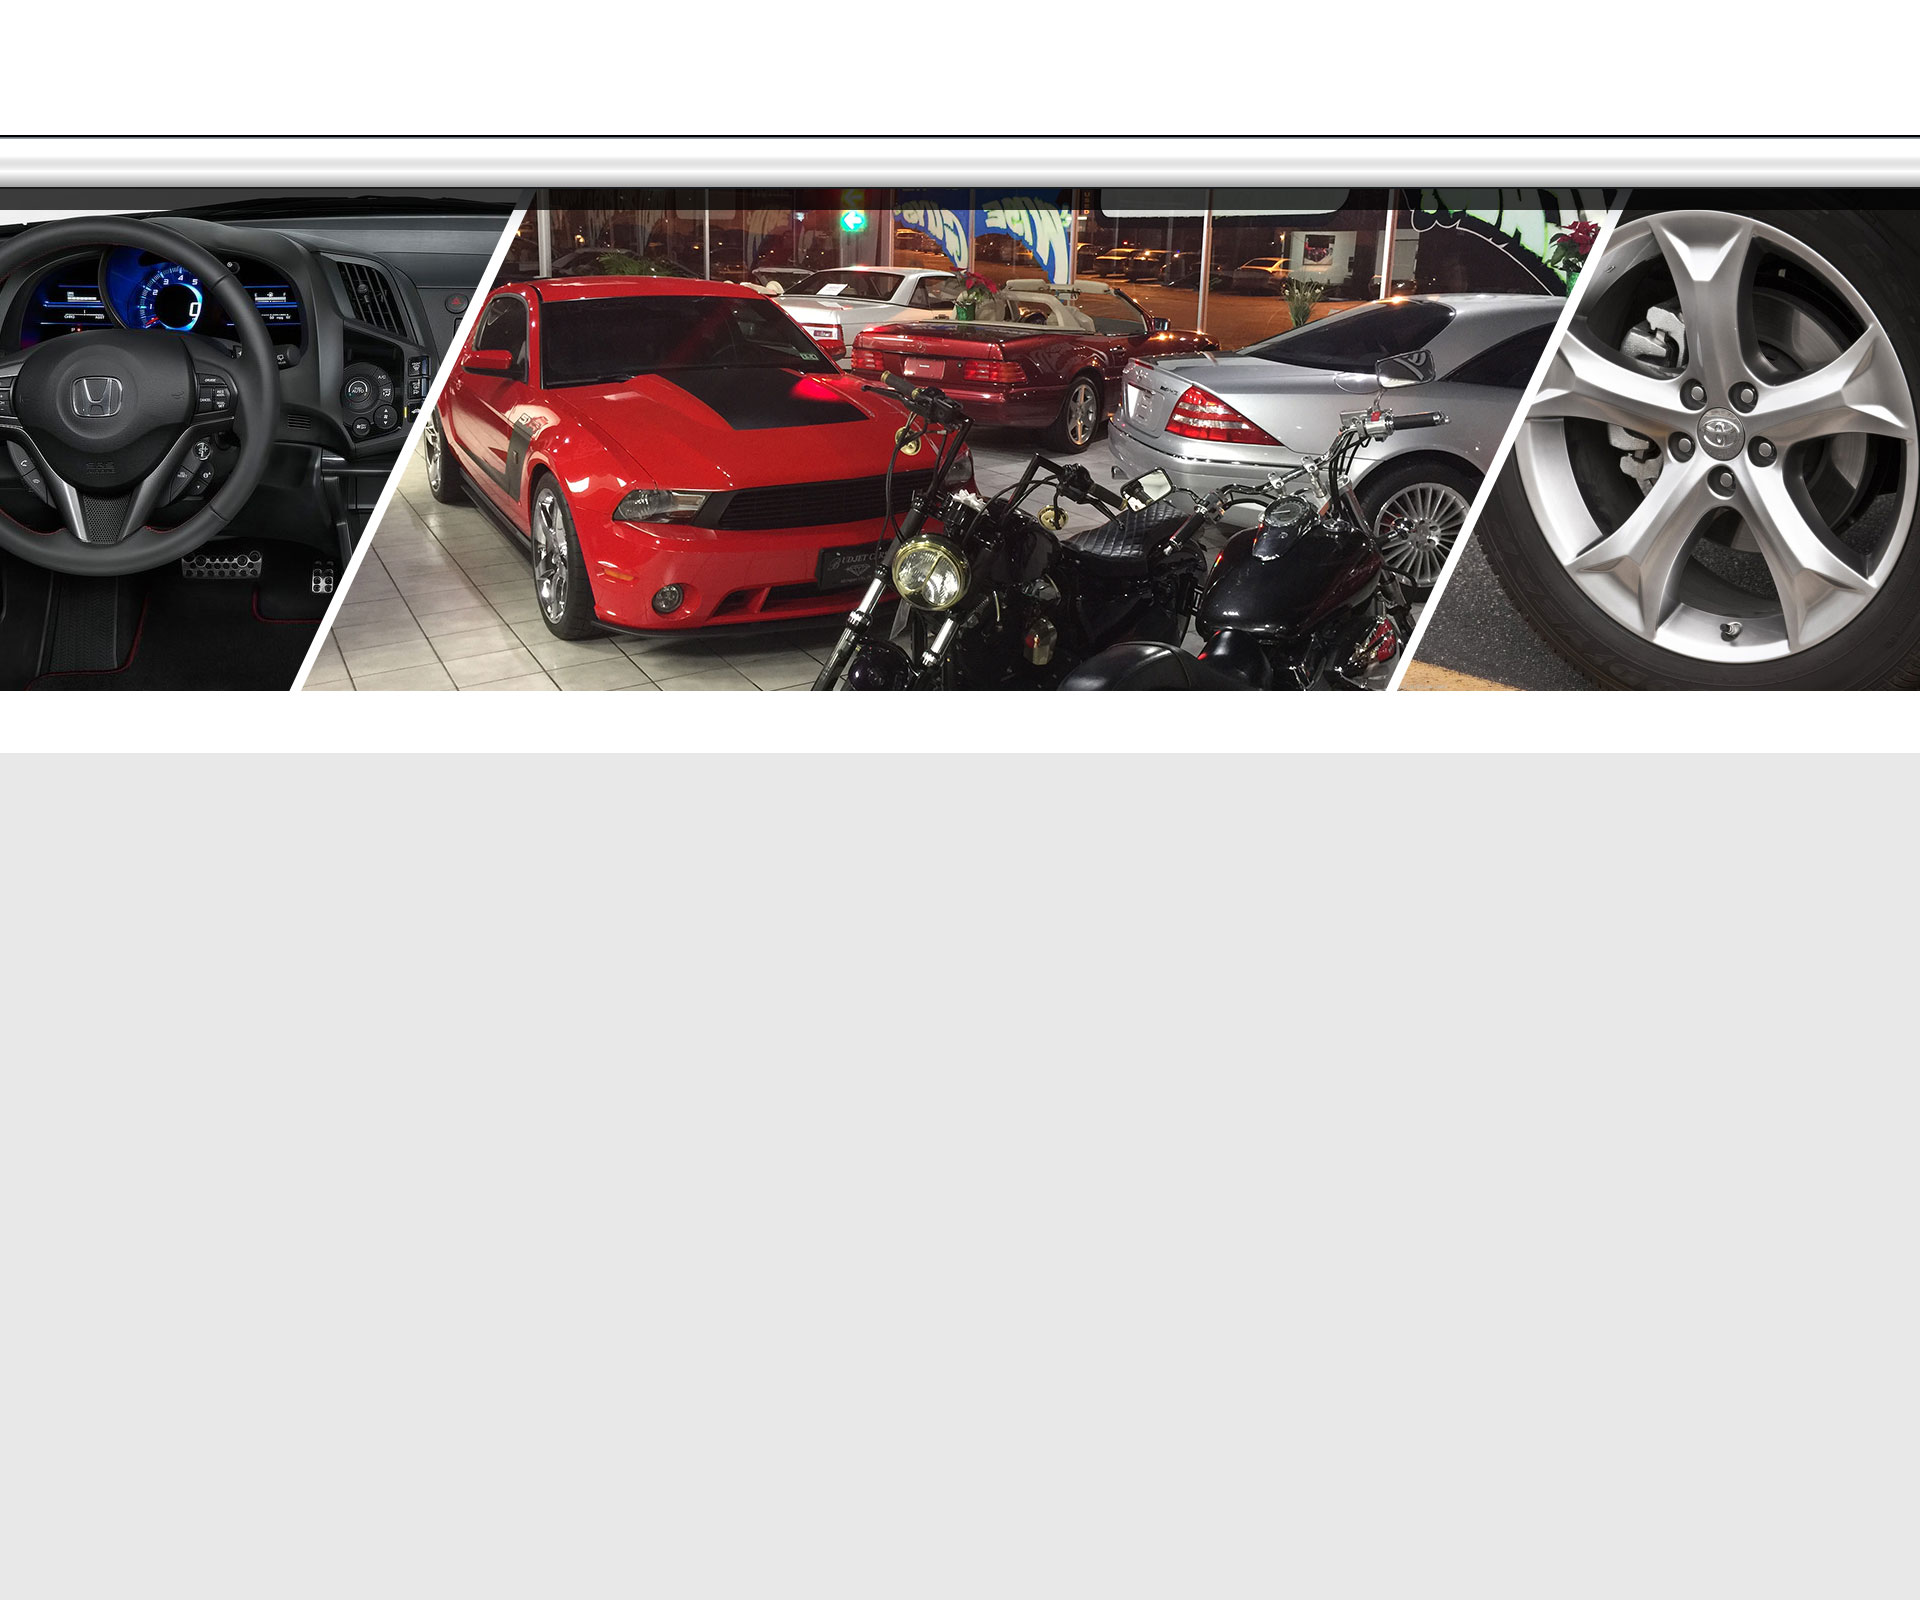 KarMart Michigan City Used Cars Michigan City IN Dealer